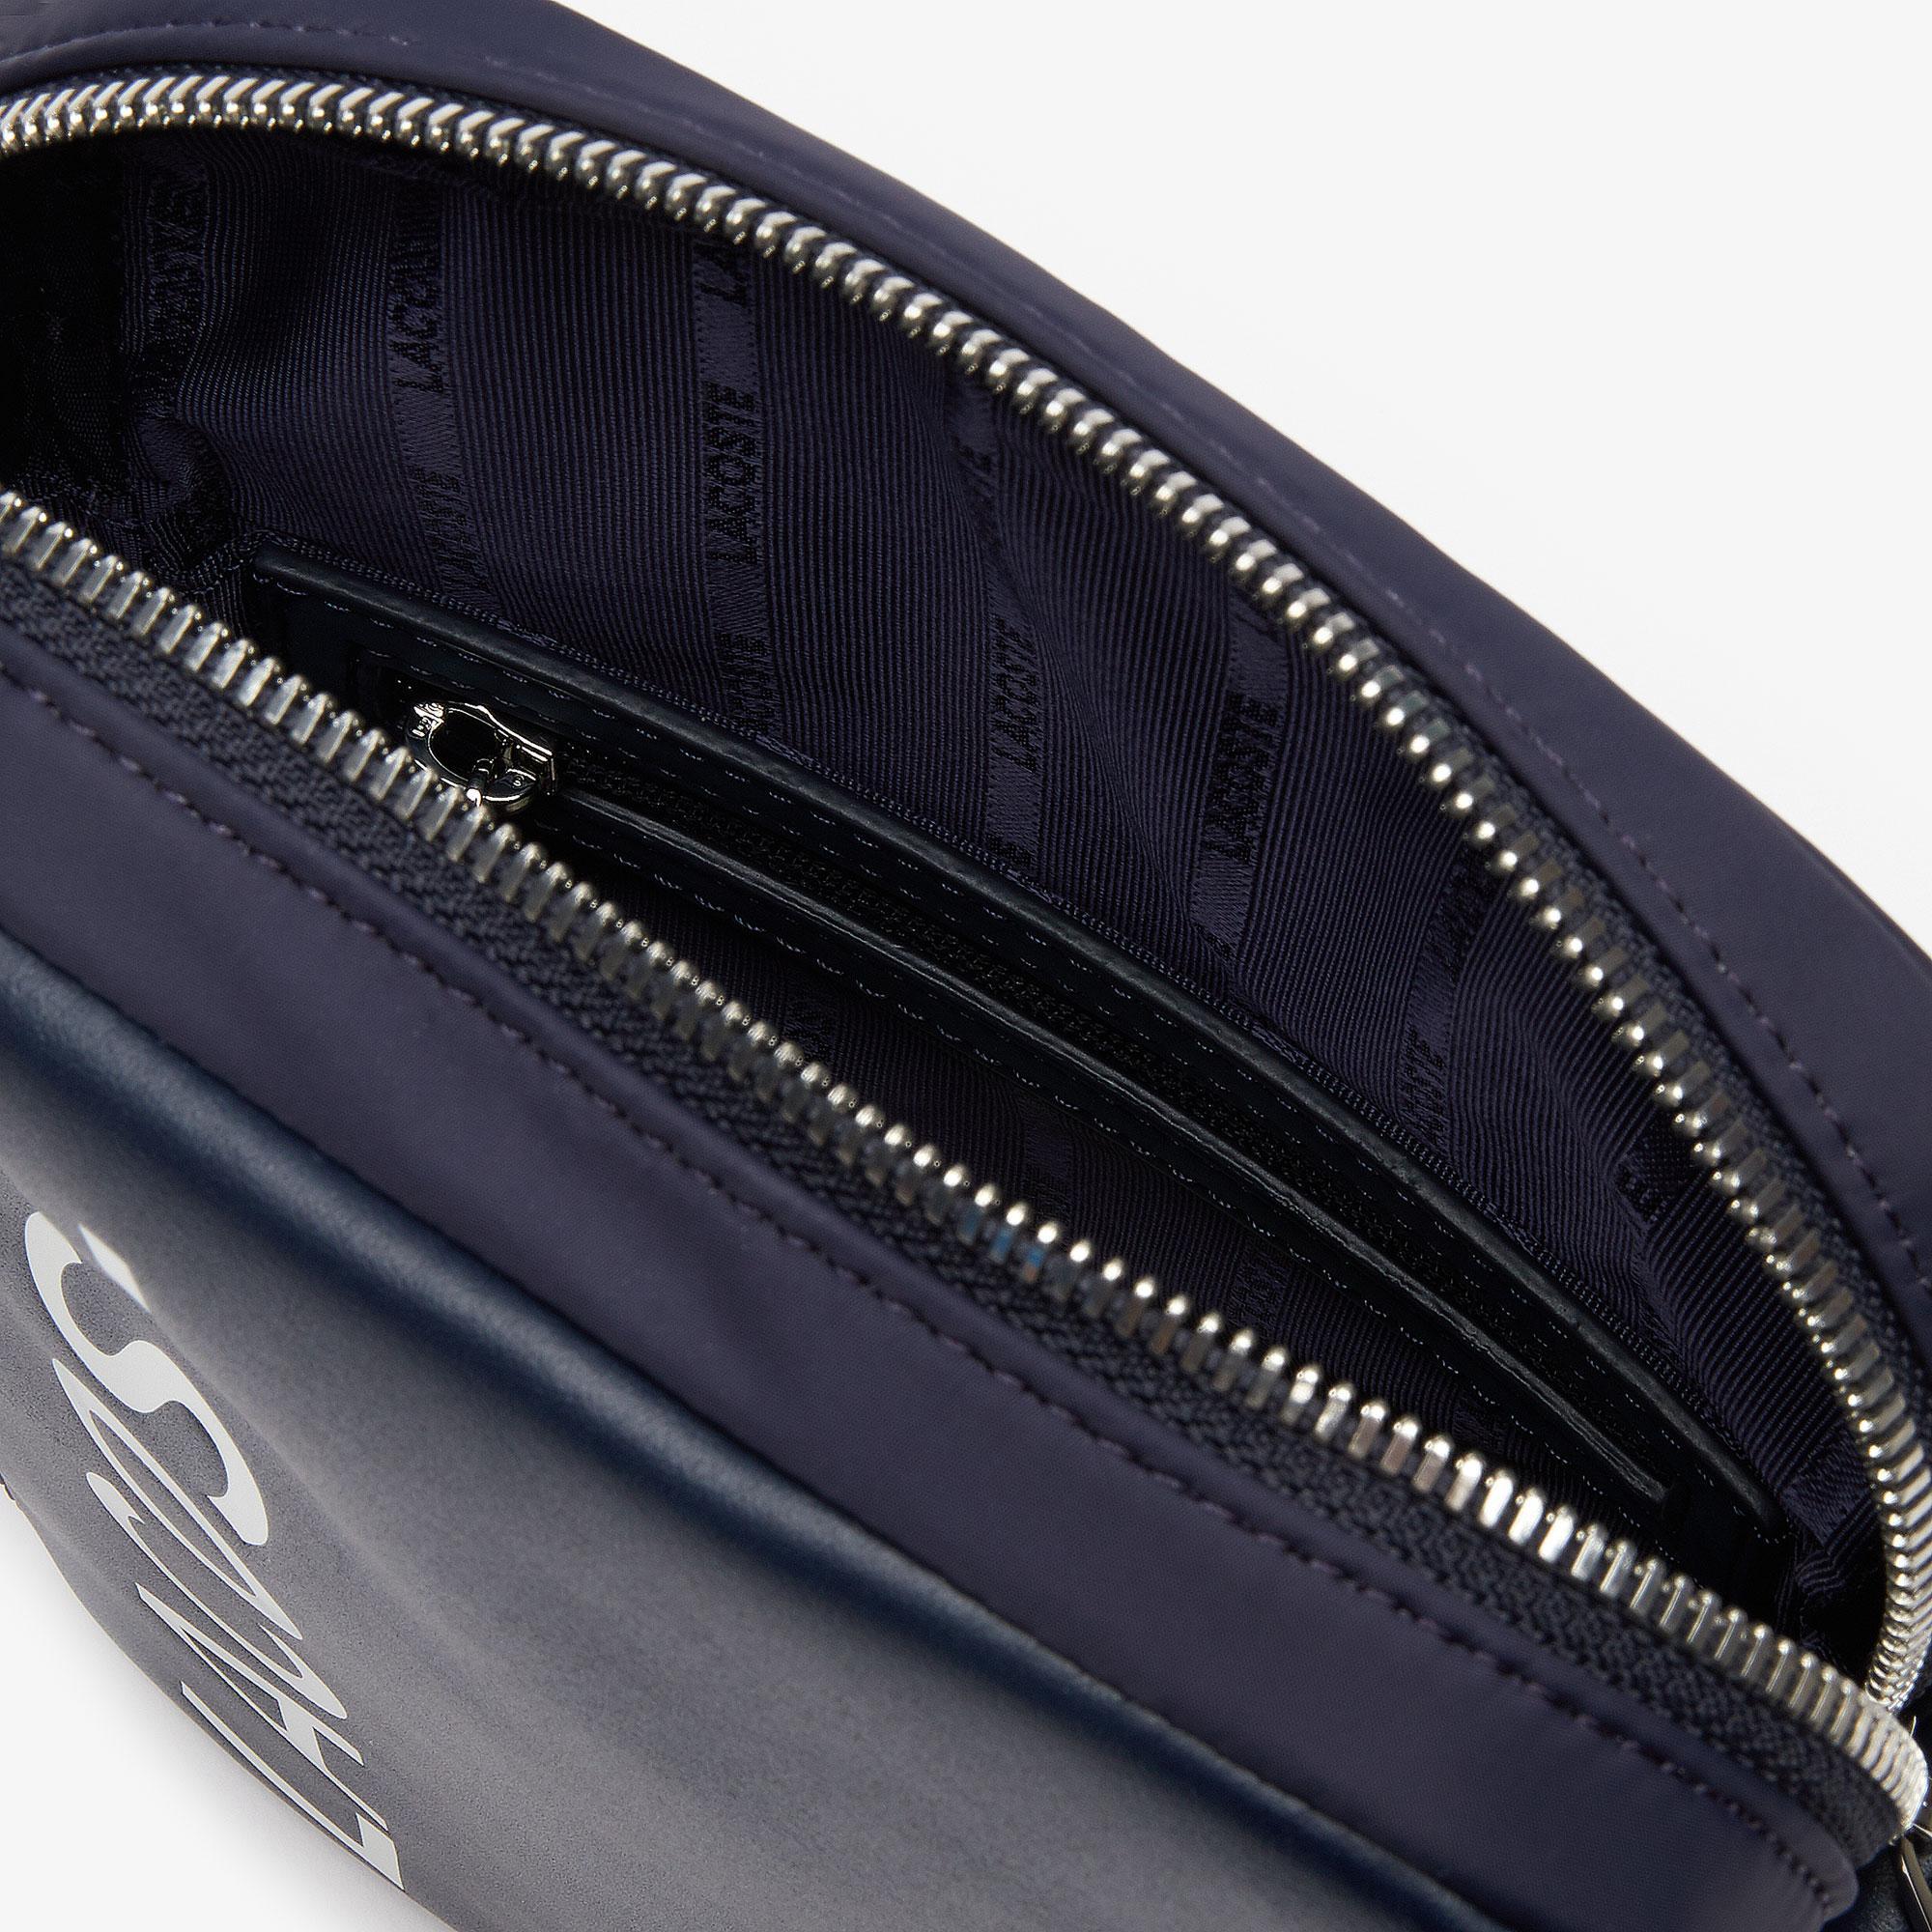 Lacoste Men's L.12.12 Signature Leather Cross Body Bag